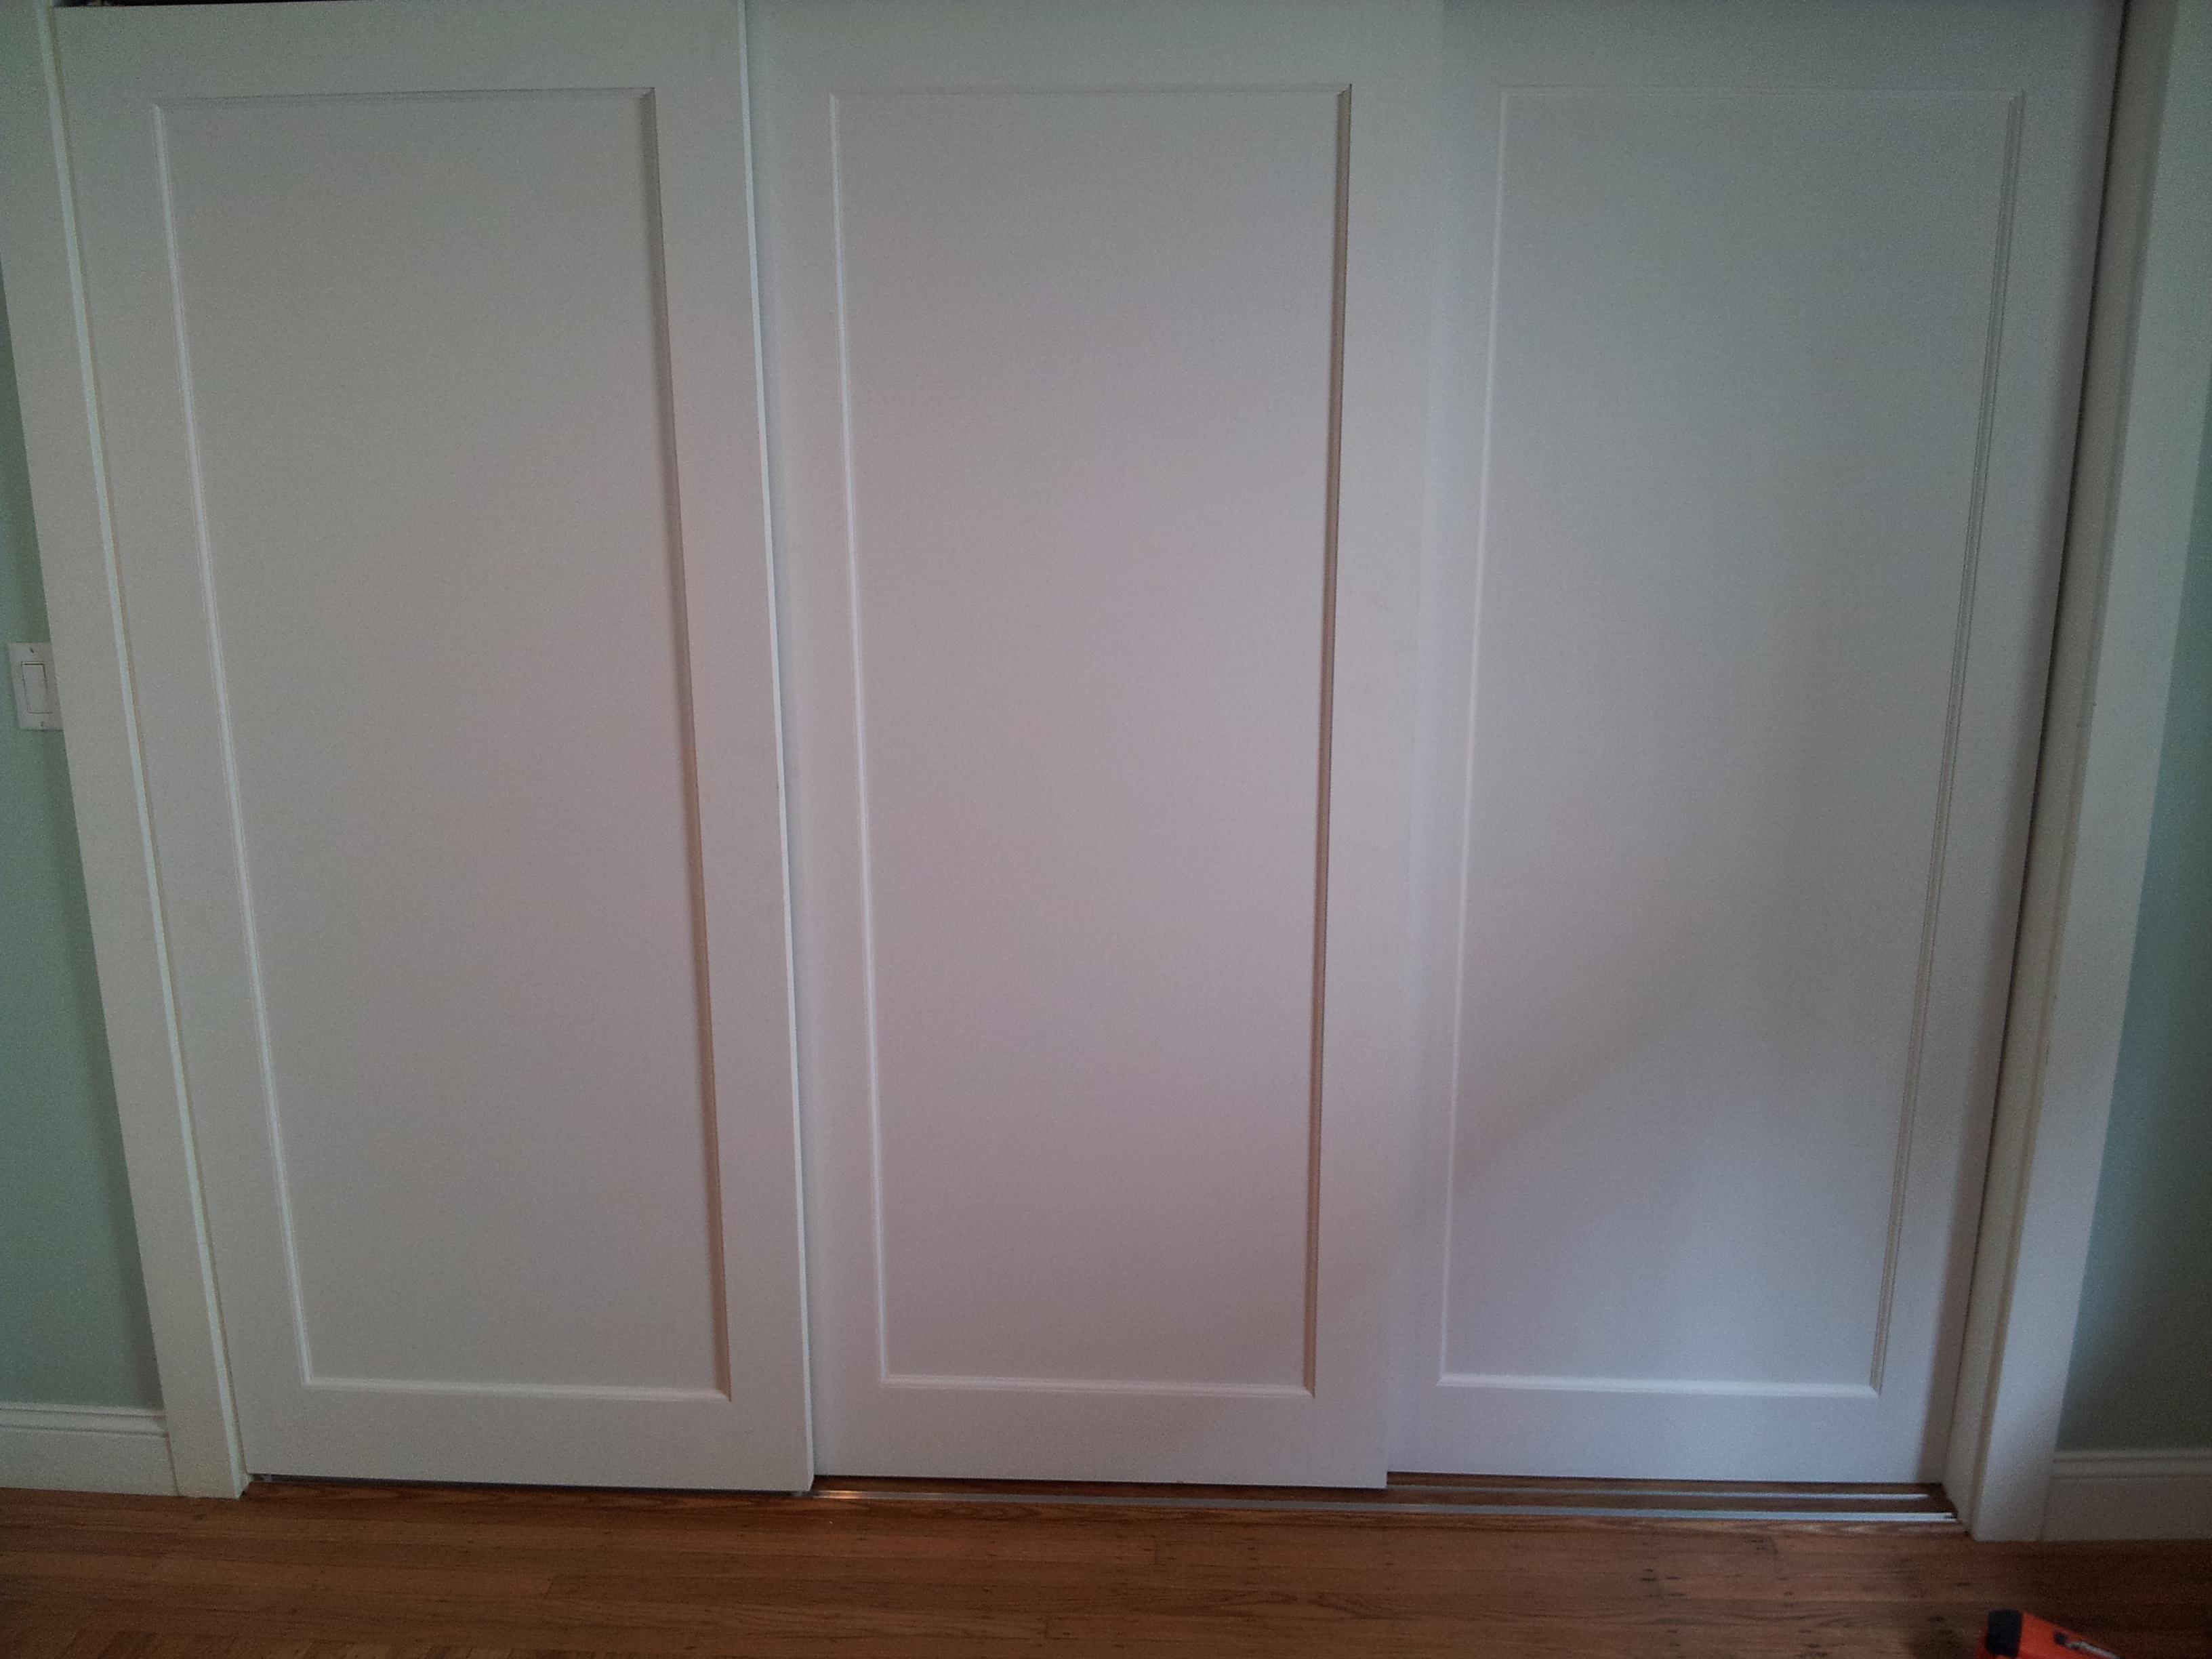 3 Panel Sliding Closet Door Track3 Panel Sliding Closet Door Track